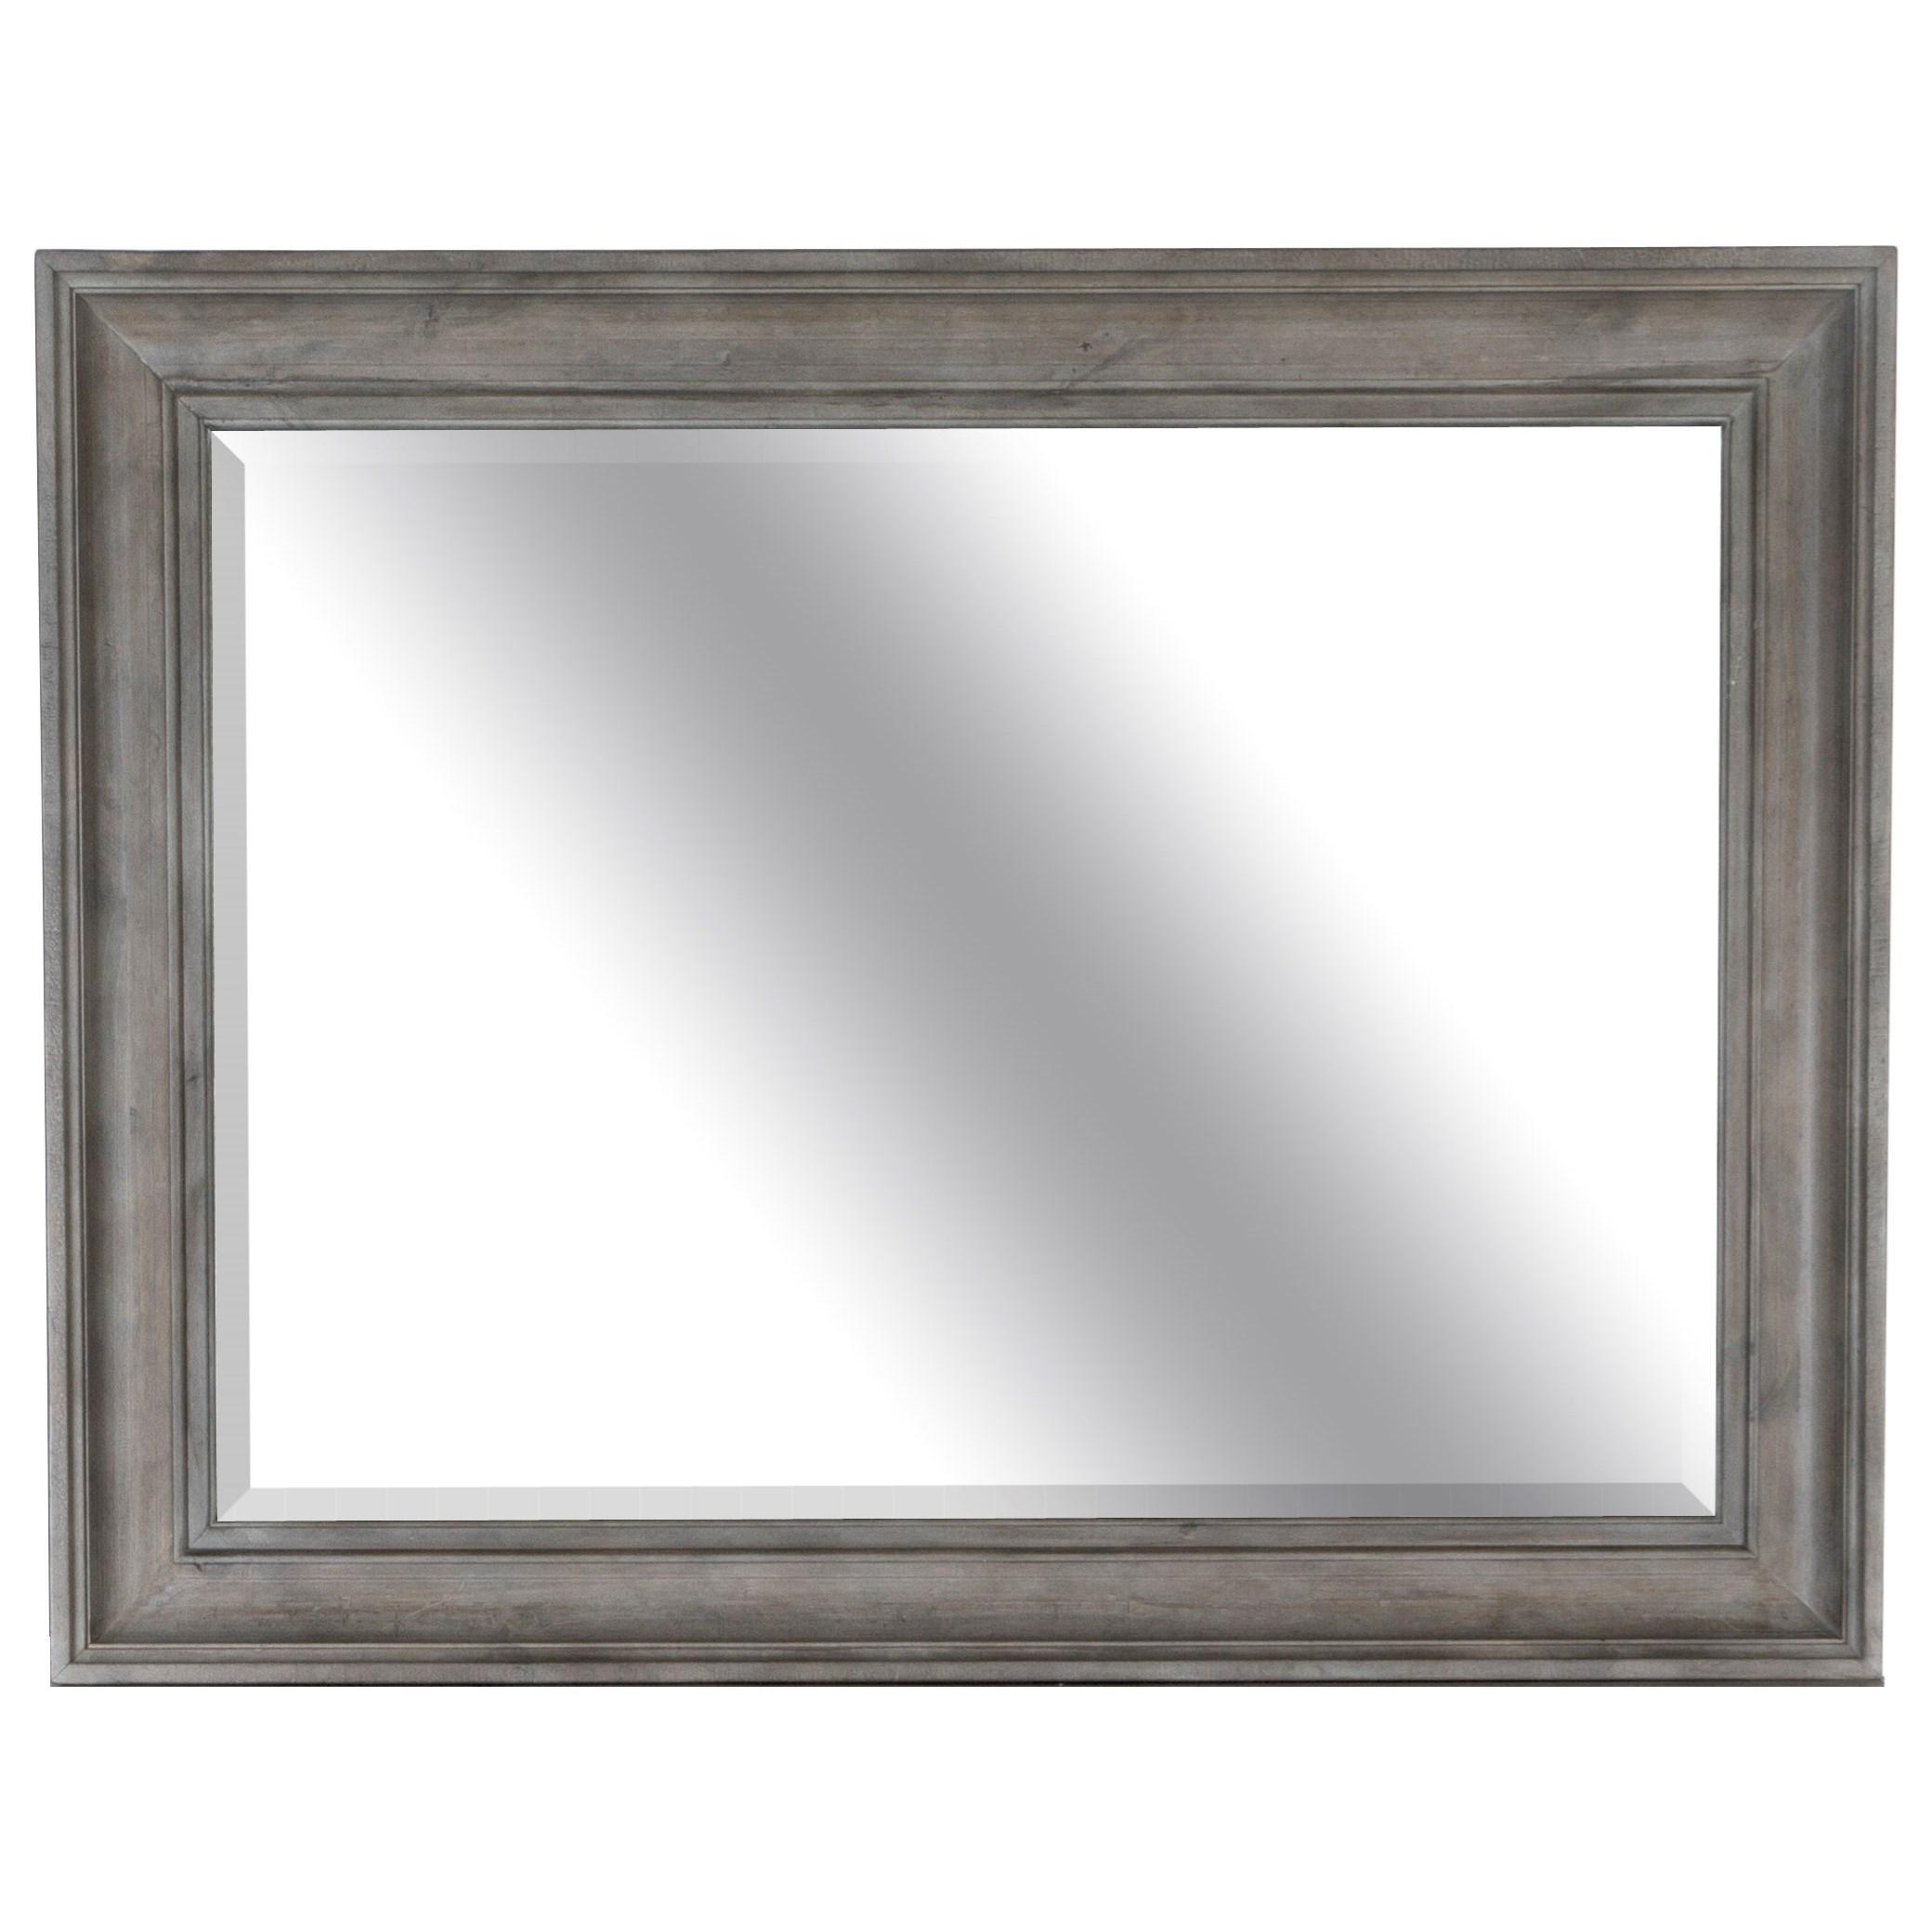 Lancaster Dresser Mirror by Magnussen Home at Value City Furniture